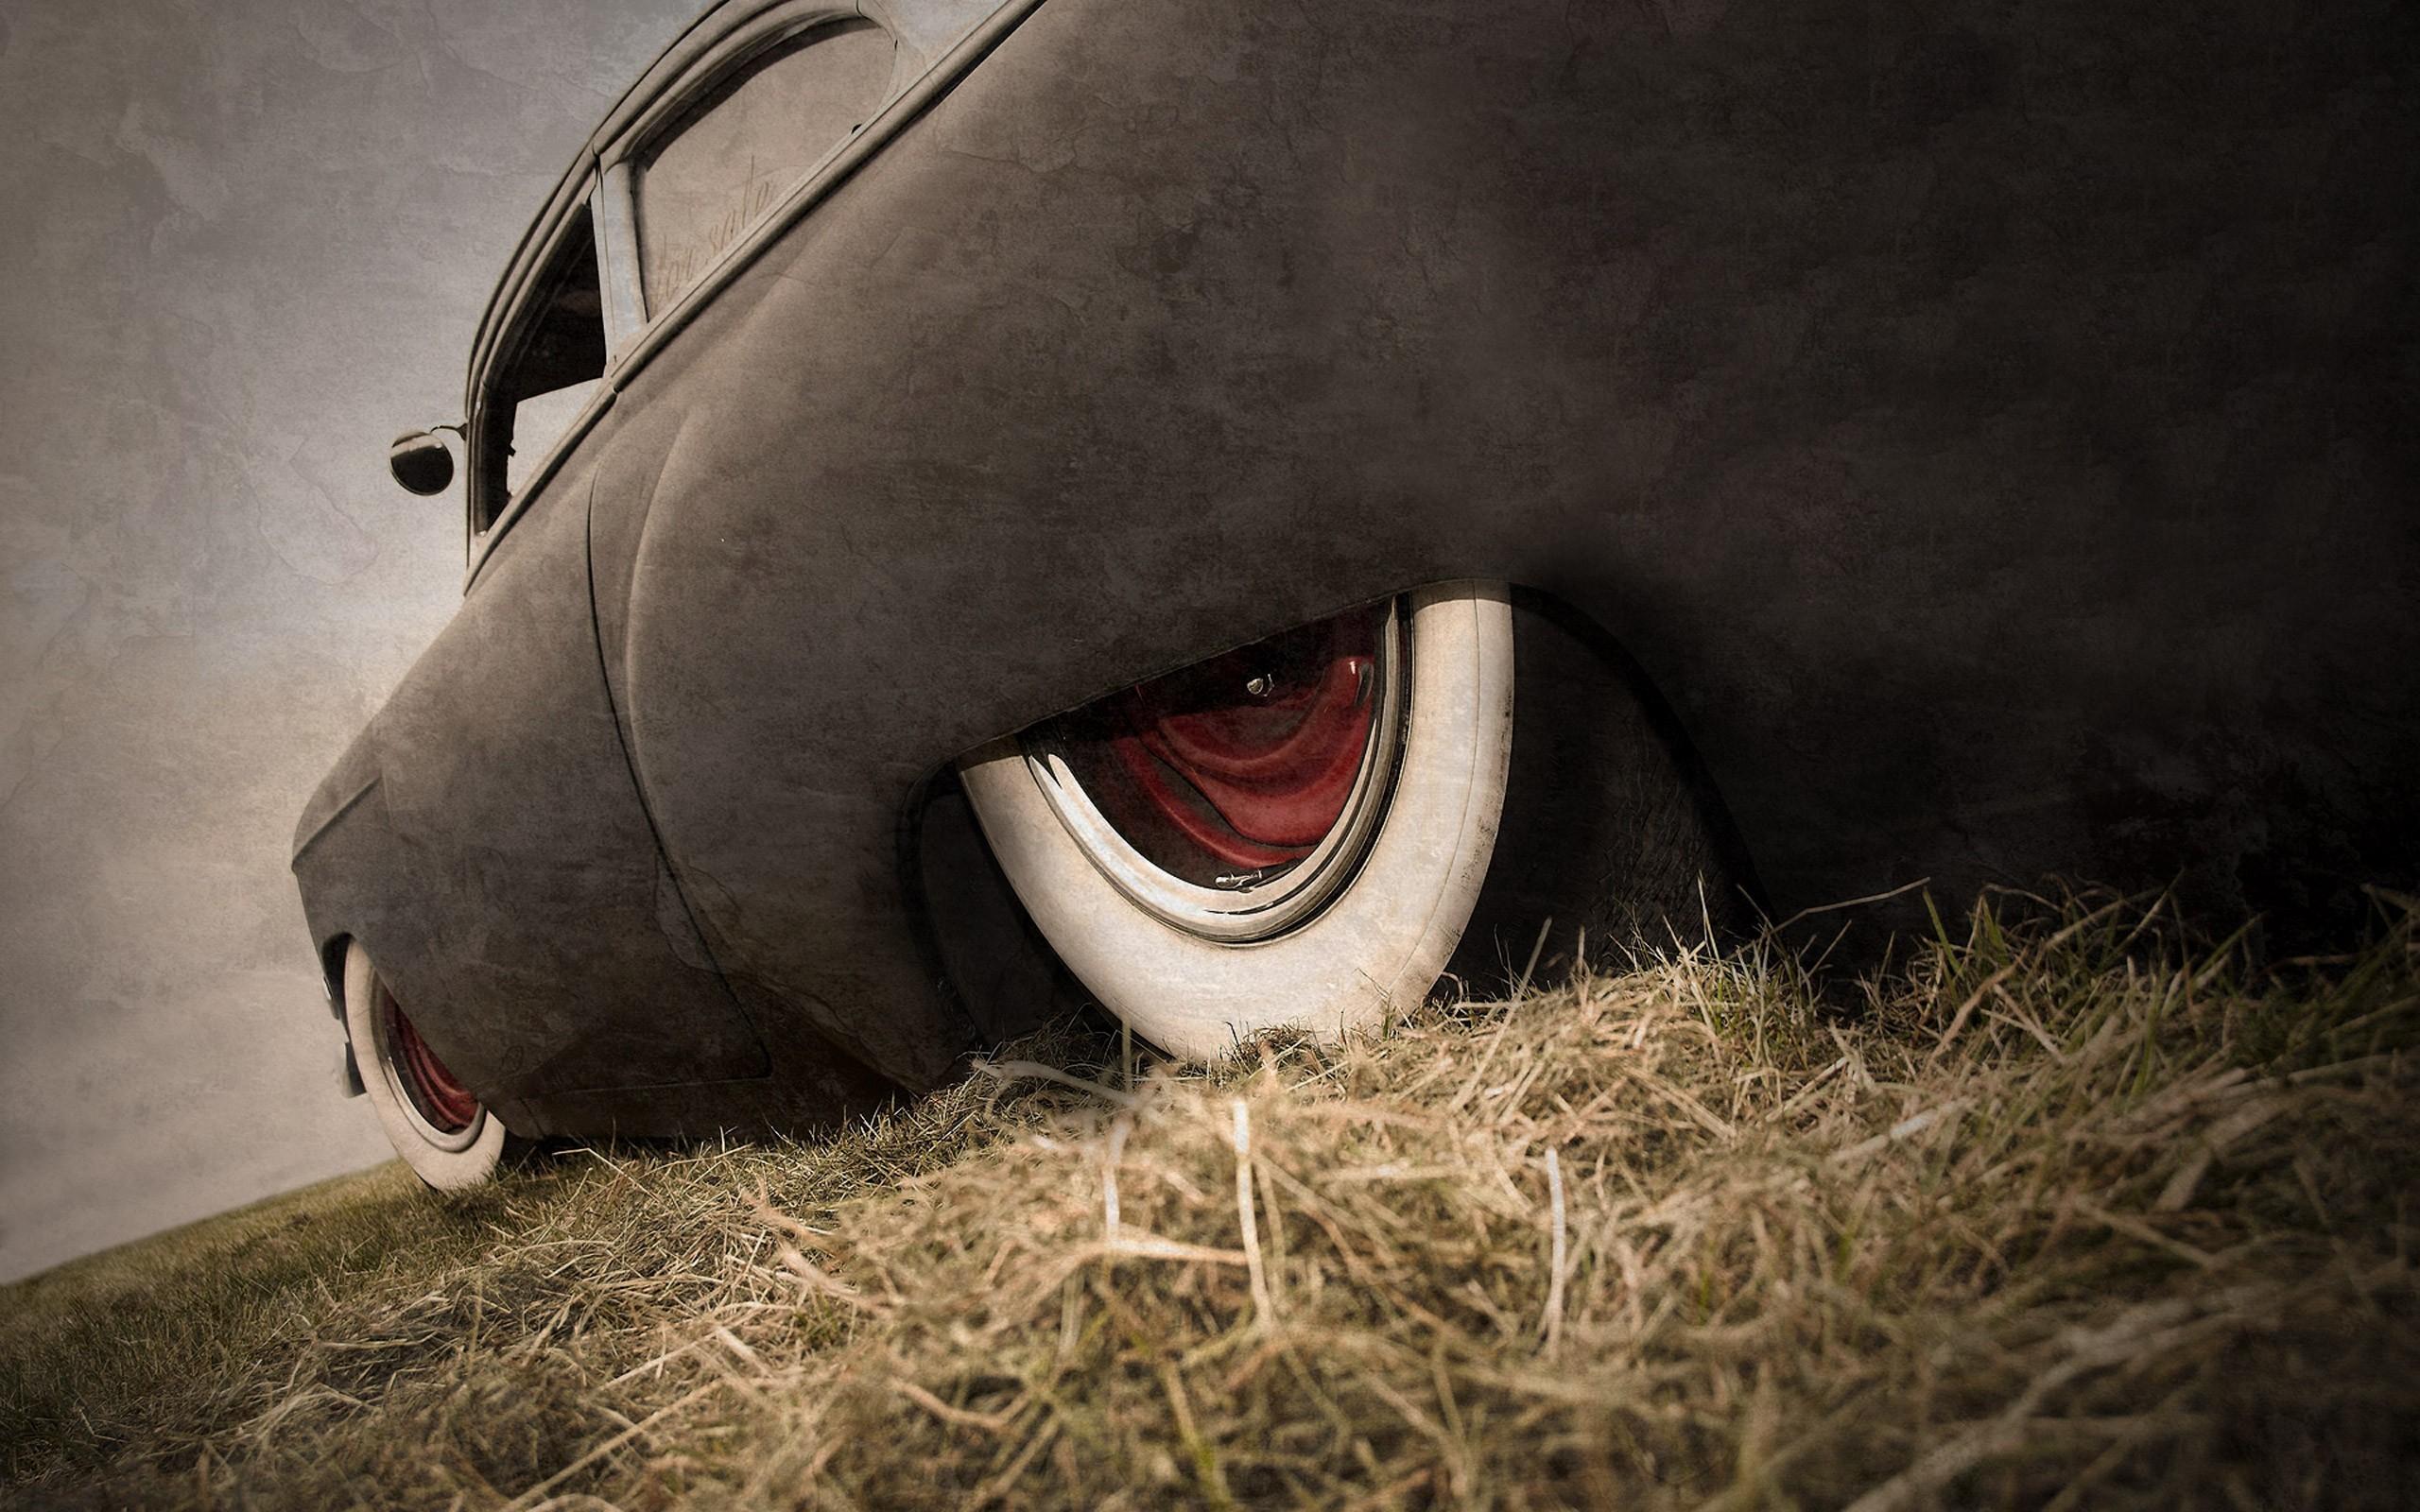 Lowrider Hot Rod Classic Car Grass Rat Rod Wallpaper - Auto Rat Rod Hd - HD Wallpaper